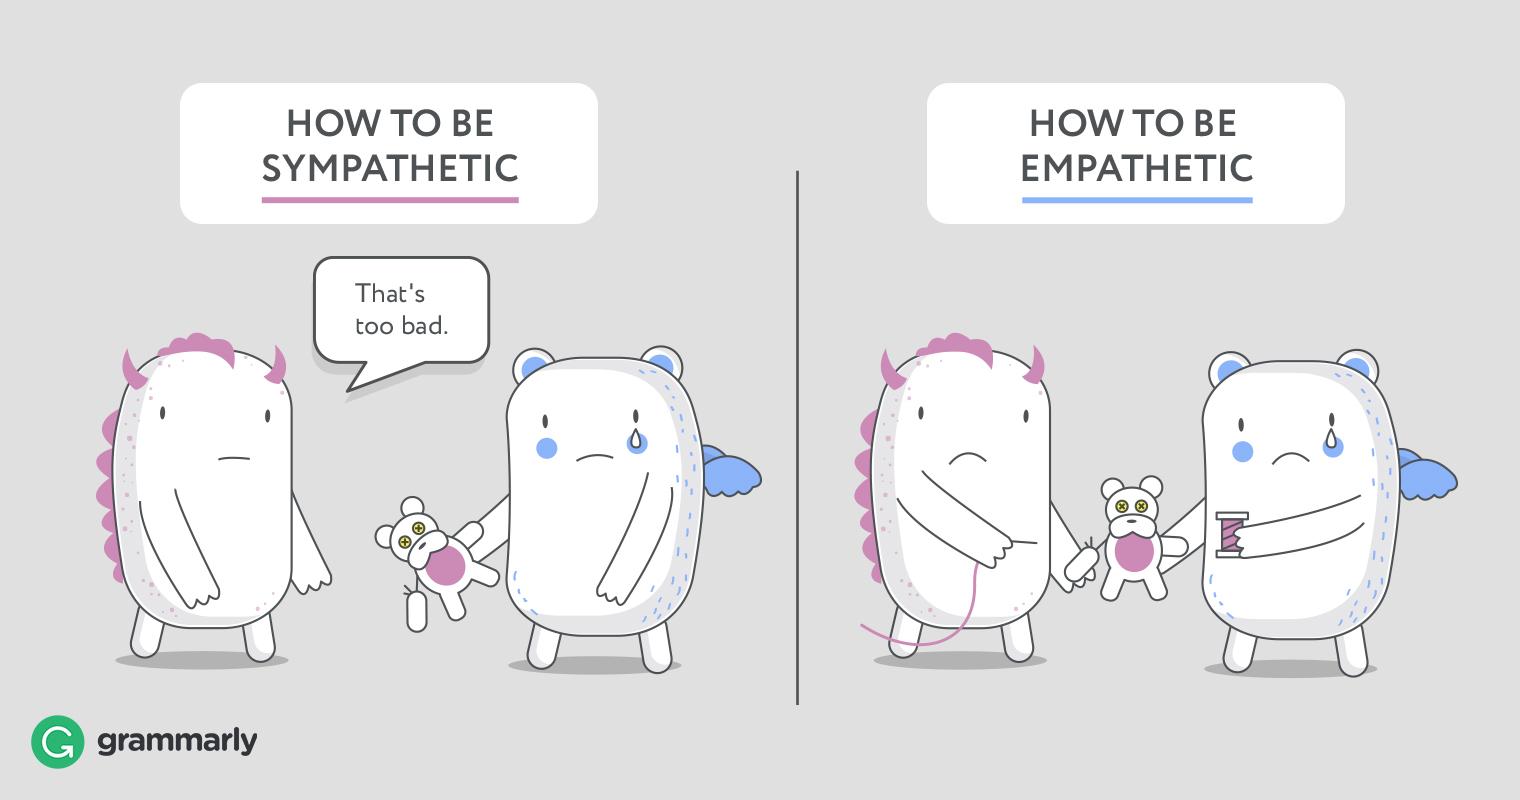 Sympathy-that sucks. Empathy-this really sucks for me too.  (Image)